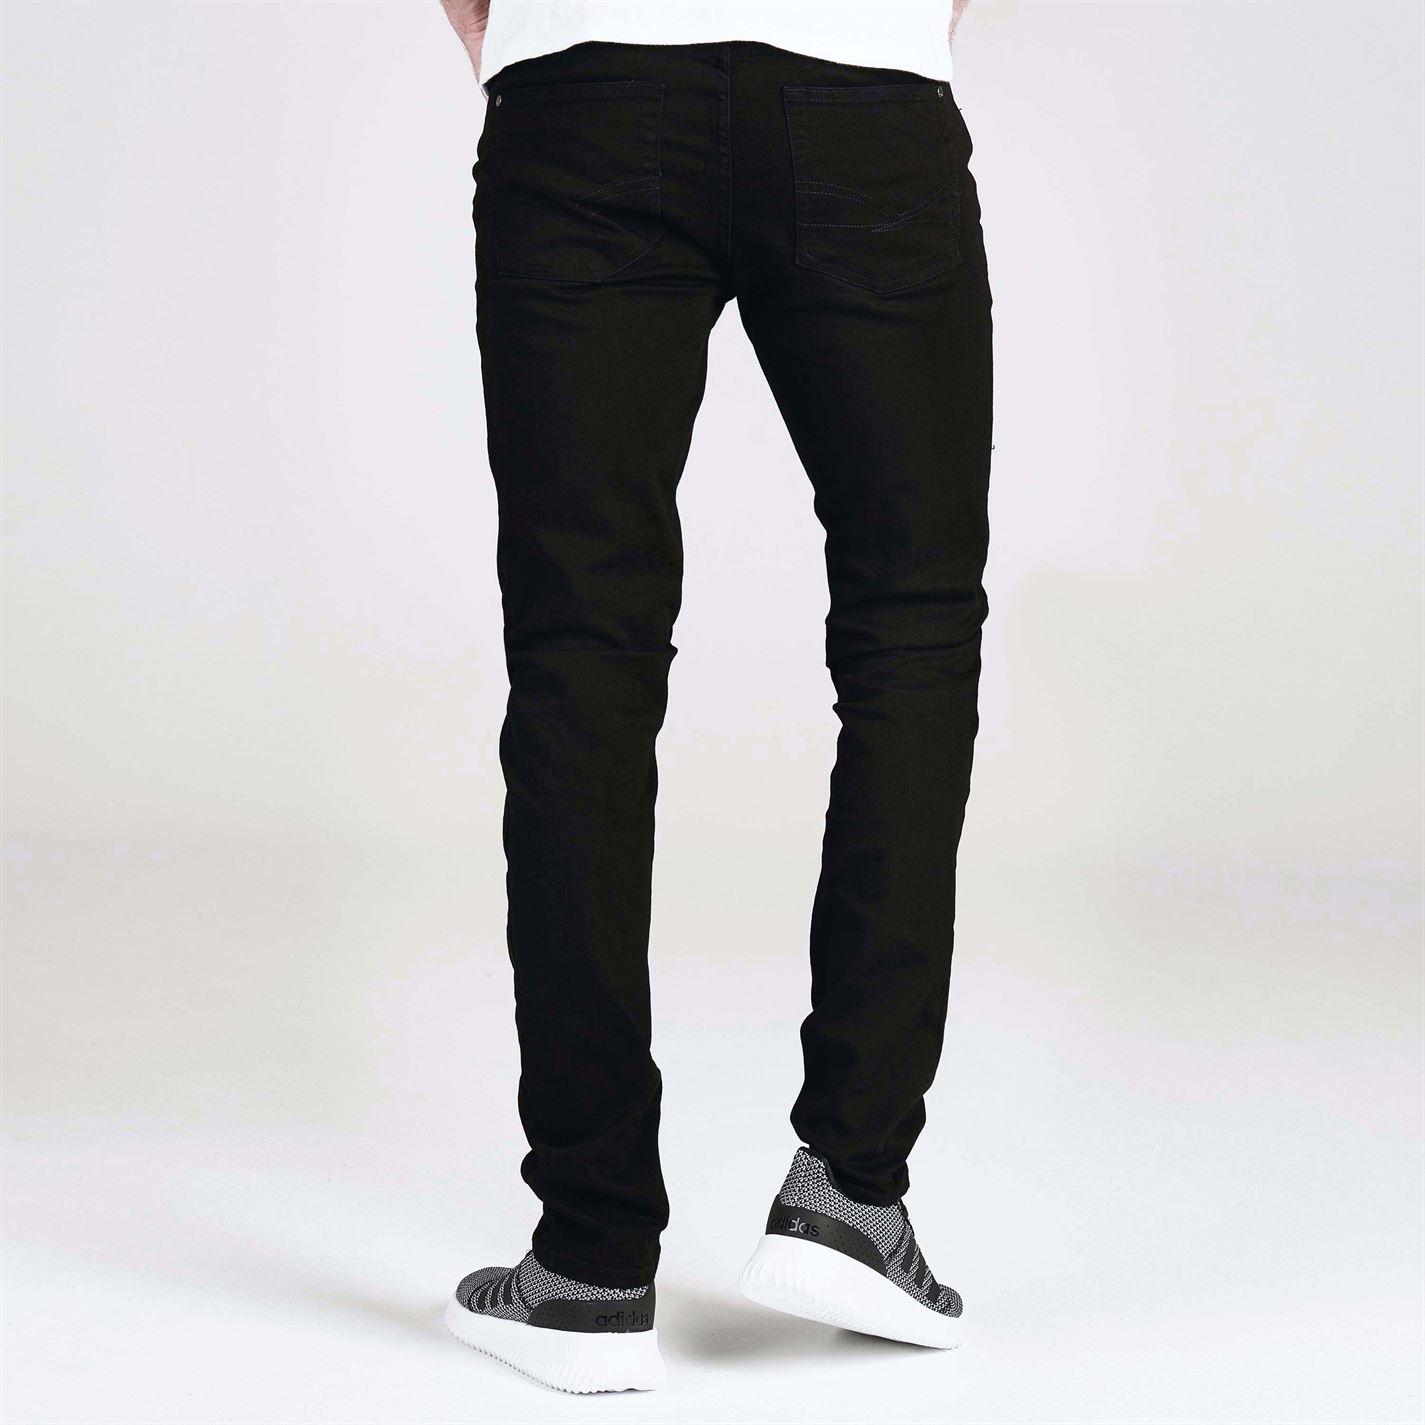 Jeans-Denim-Firetrap-Skinny-Mens-Trouser-Black thumbnail 17